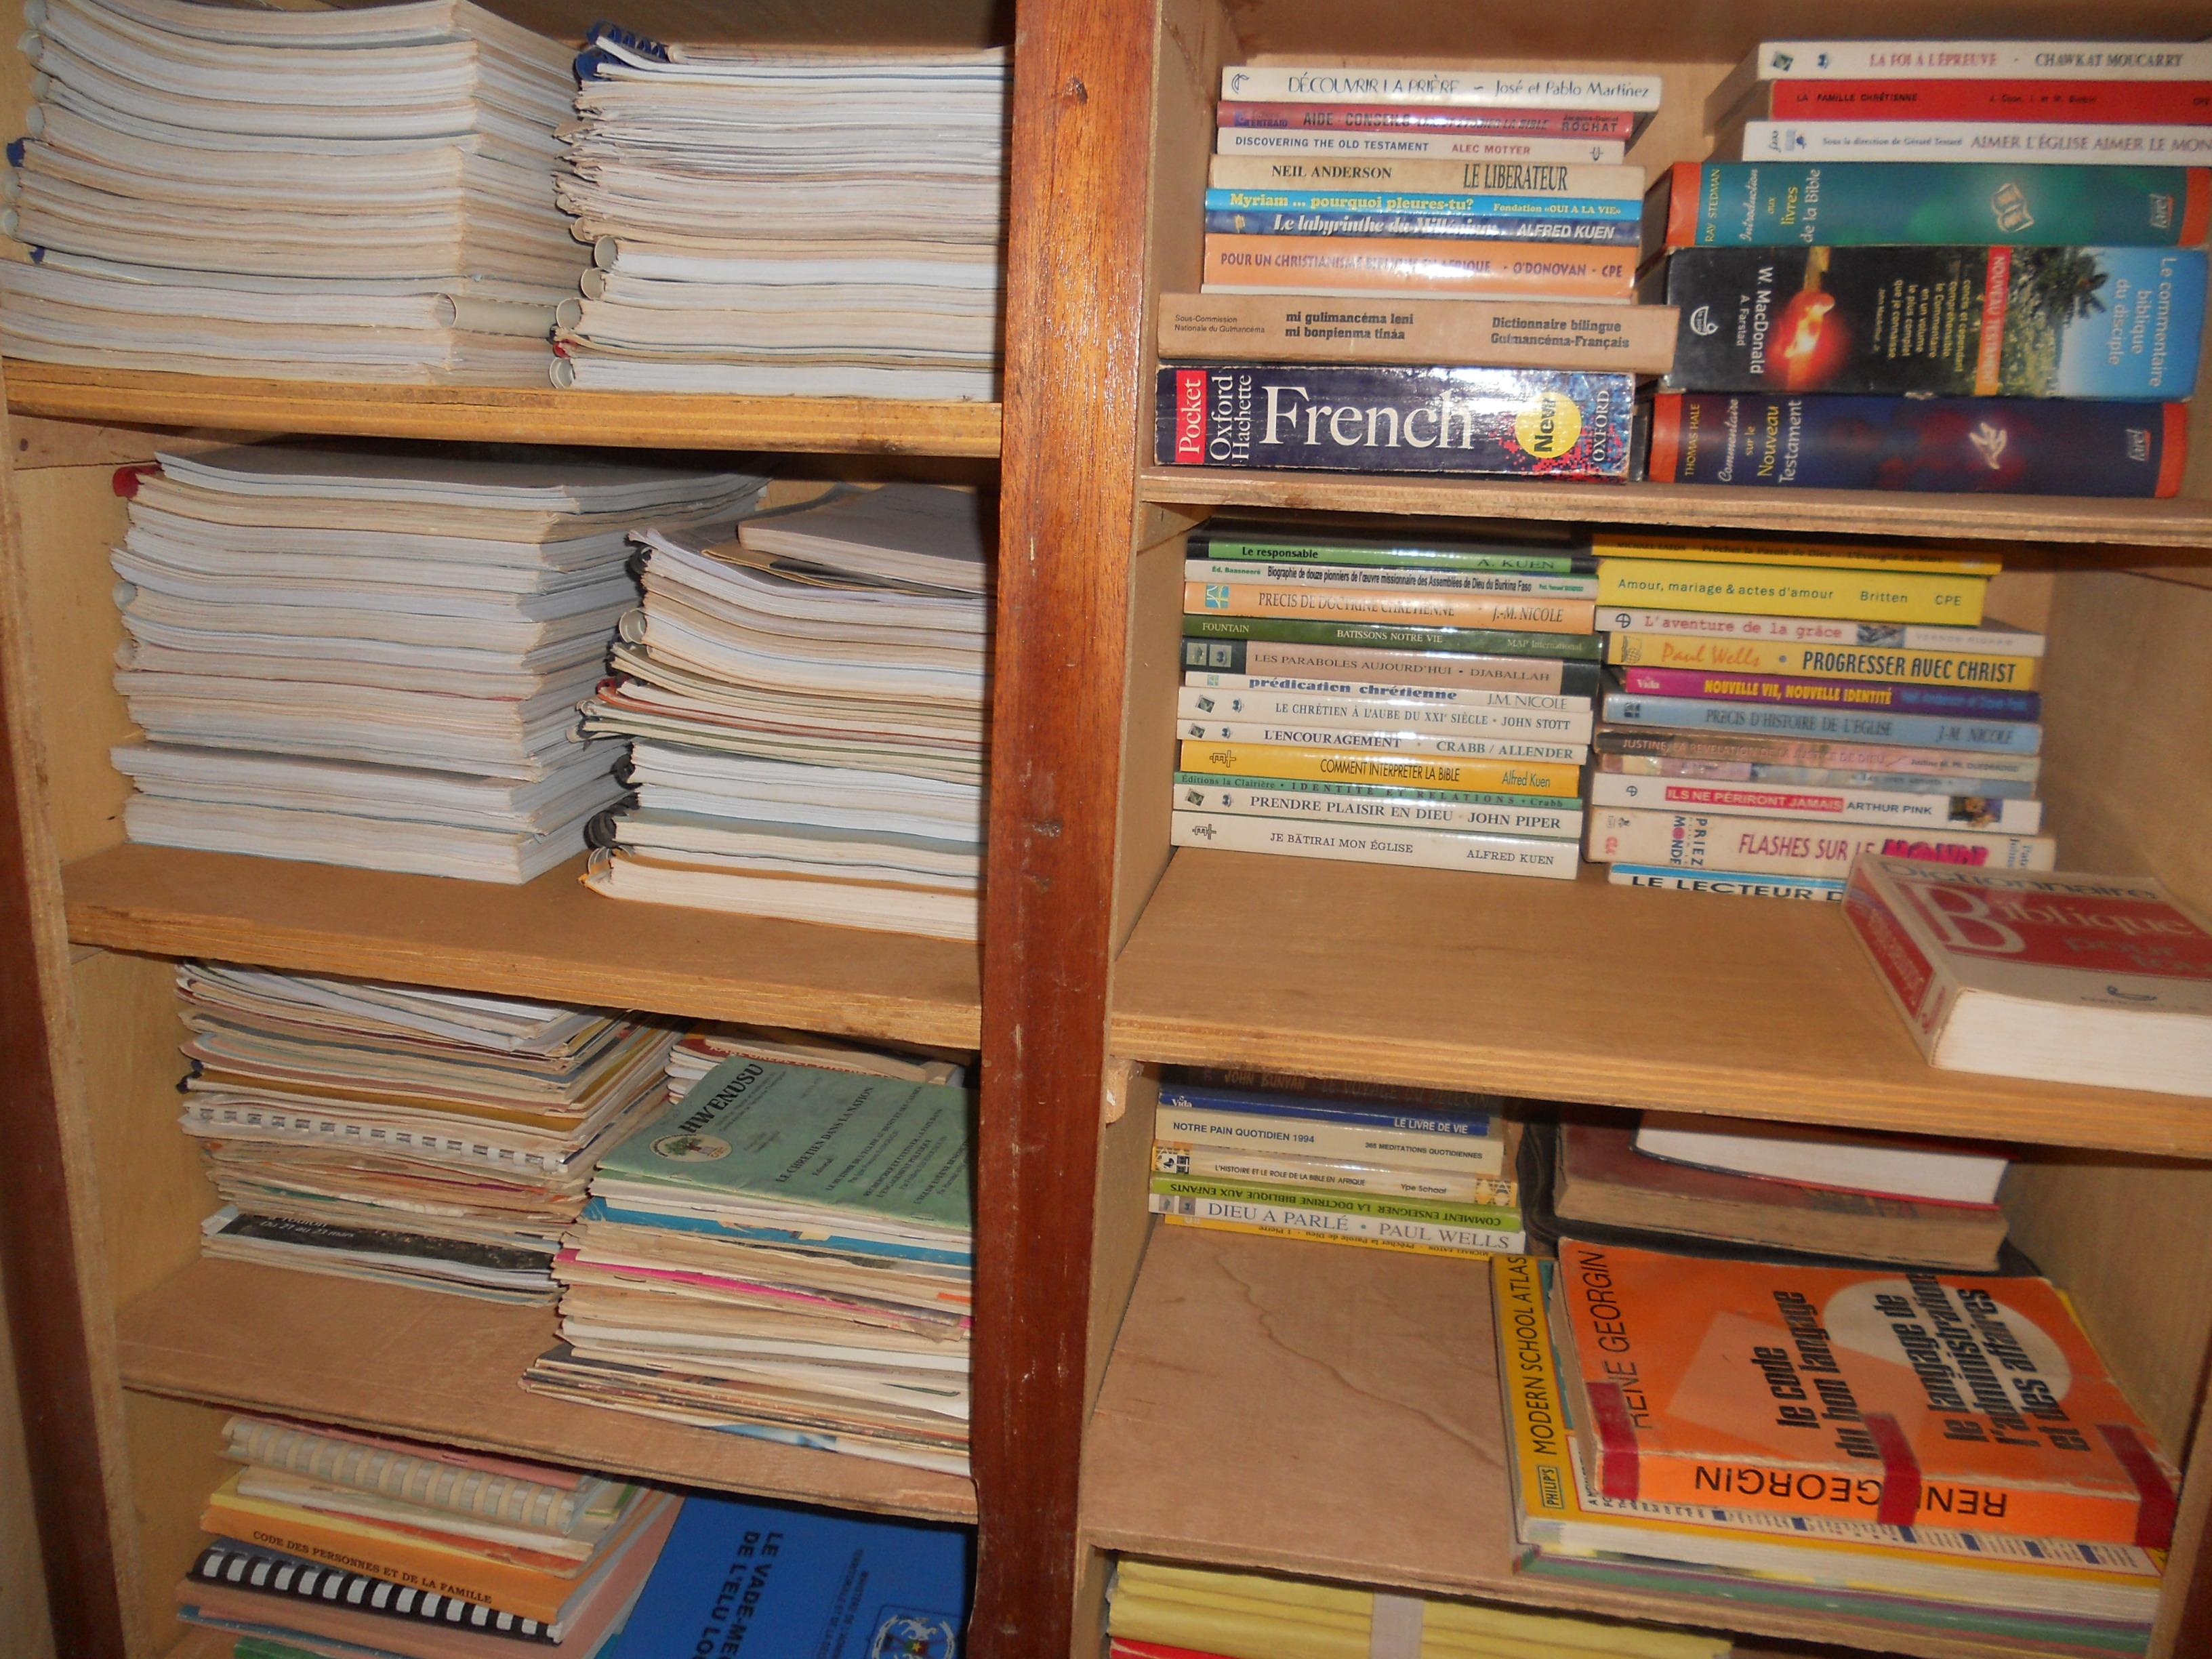 Book shop for self help agriculture etc books  ASAP, Burkina Faso via Lankao